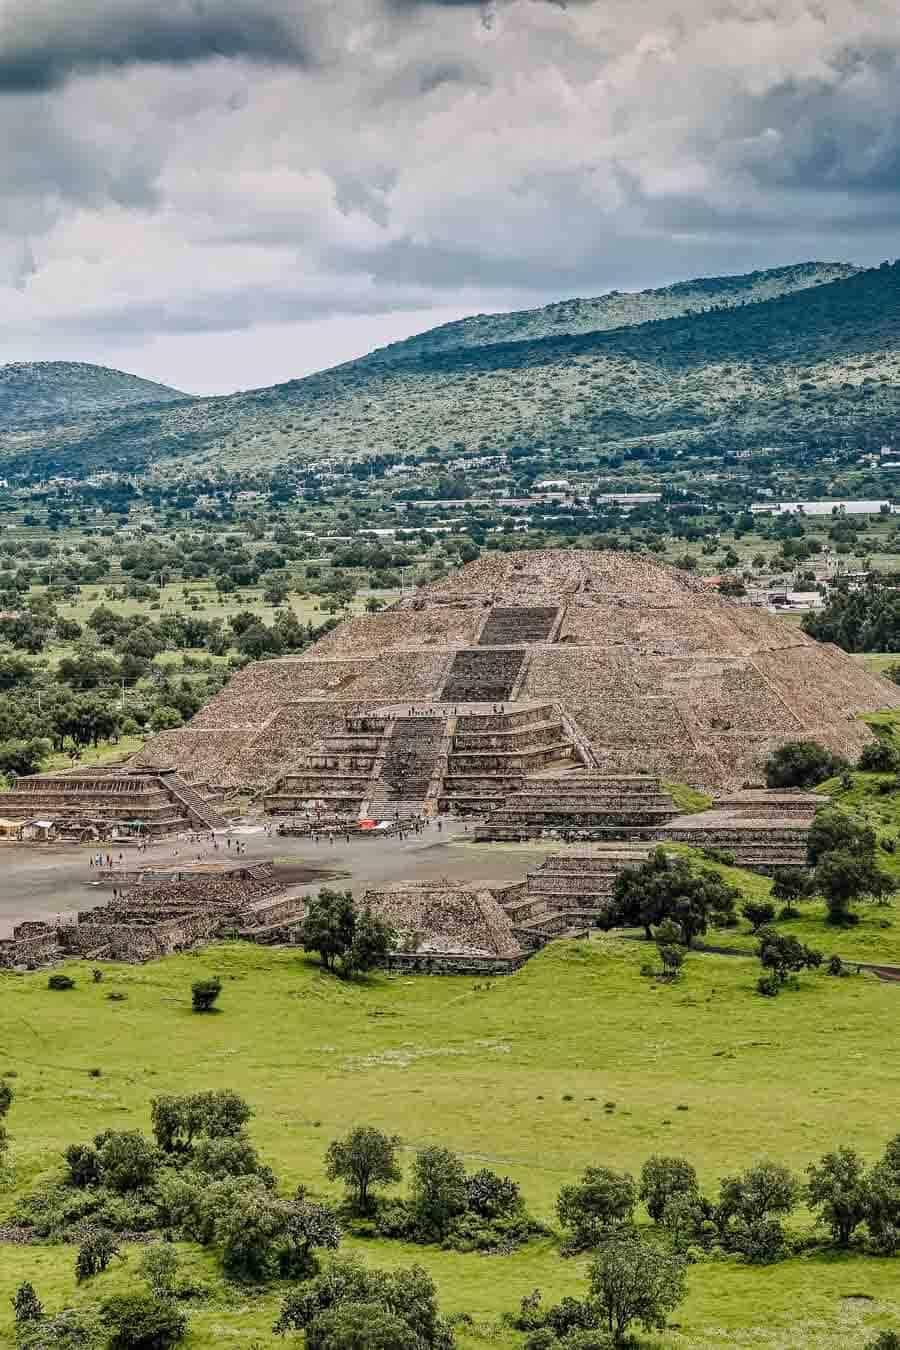 Teotihuacan Mayan ruins in Mexico